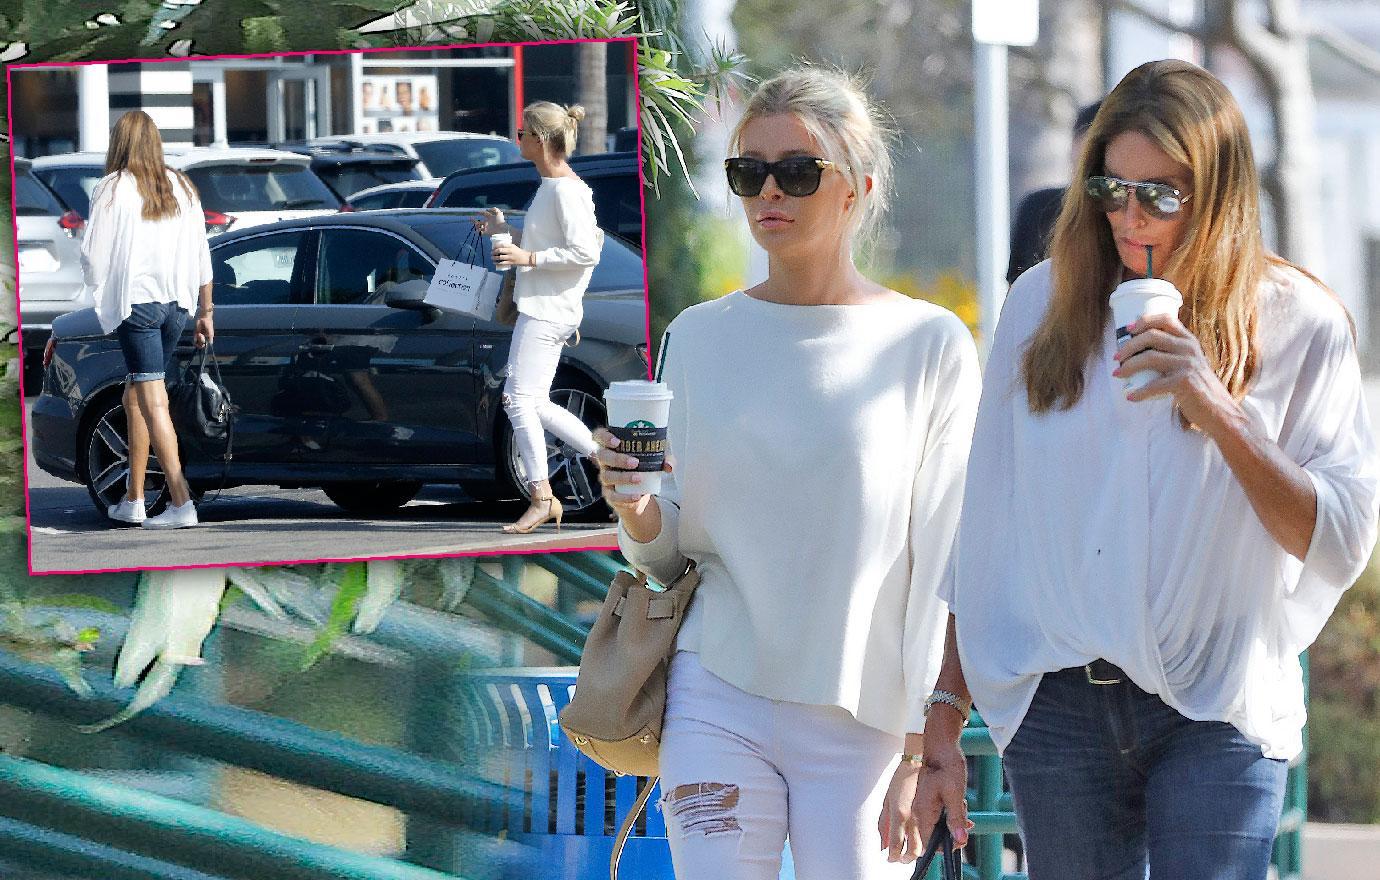 Caitlyn Jenner Girlfriend Sophia Hutchins Malibu Date